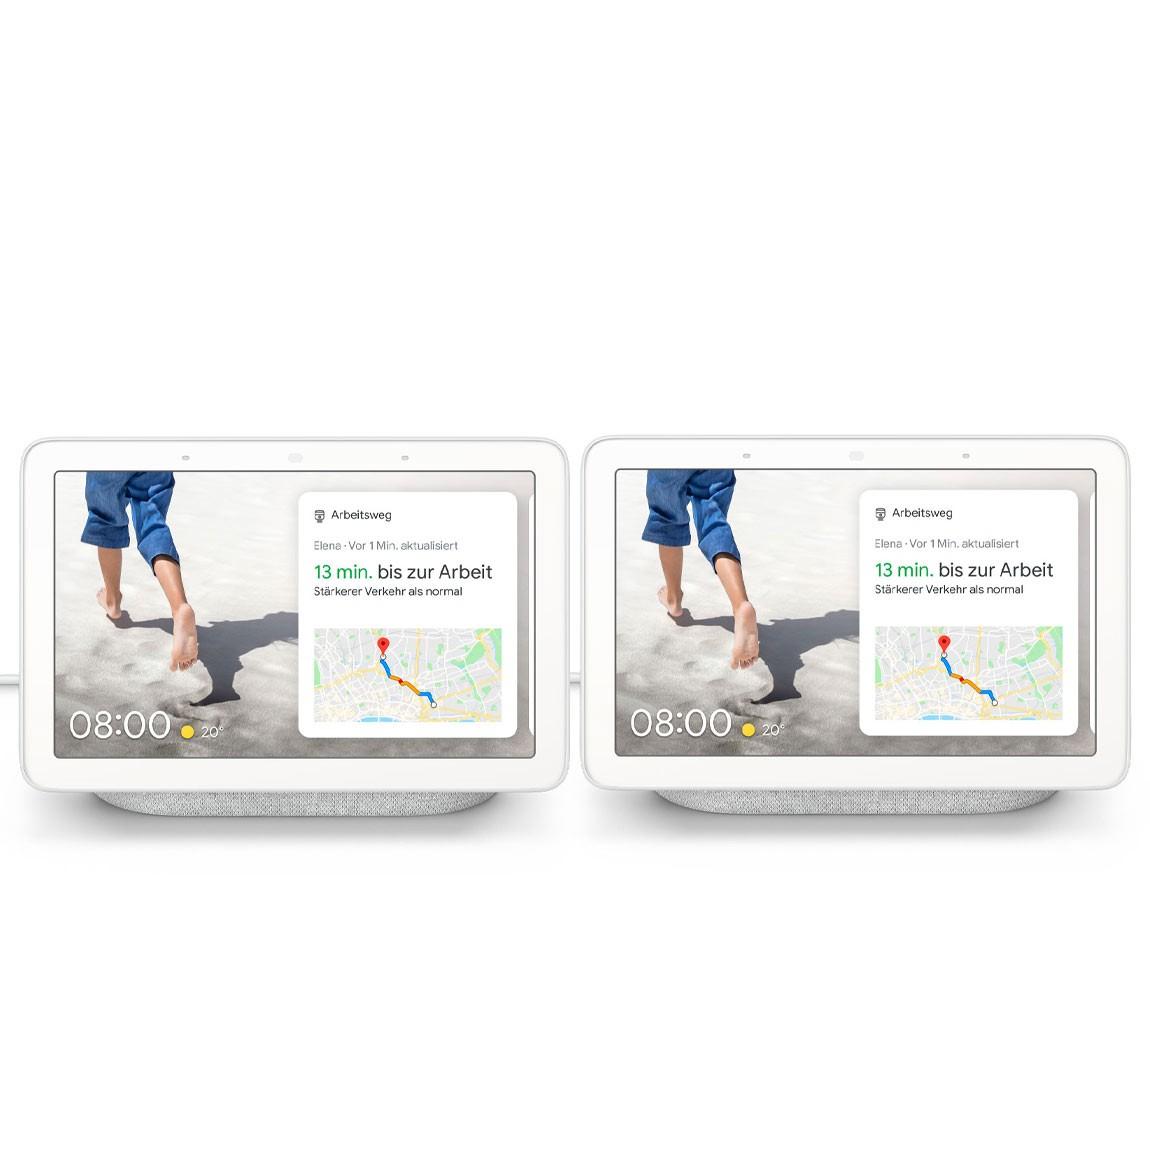 Google Nest Deals bei tink: z.B. 2x Google Nest Hub - 119€ | Nest Hub + Nest Mini - 89€ | Google Home + Philips Hue Smart Plug - 69€